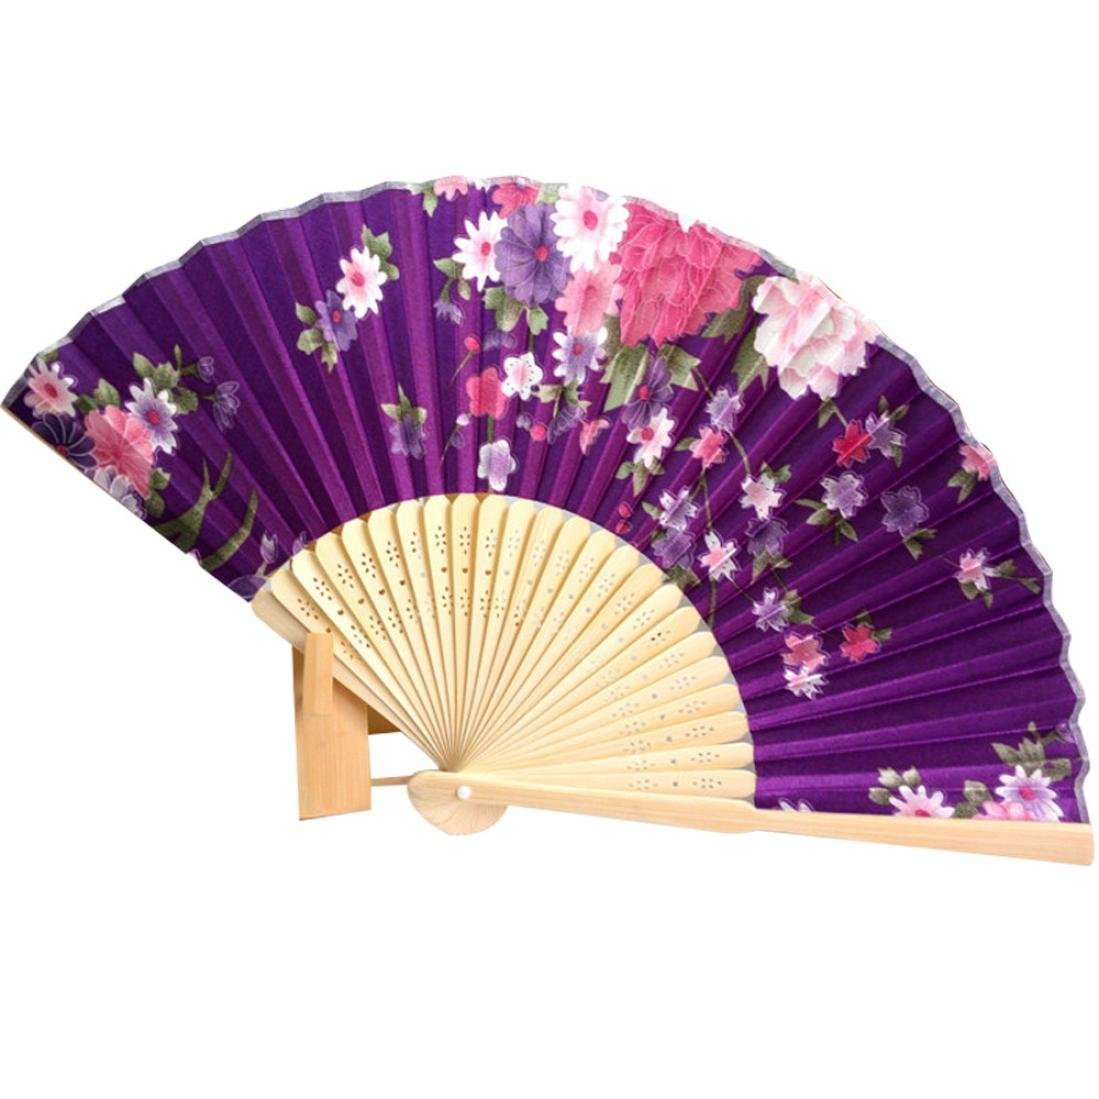 Binmer(TM) Japanese Cherry Blossom Folding Hand Dancing Wedding Party Decor Fan Chinese Fans (Purple)